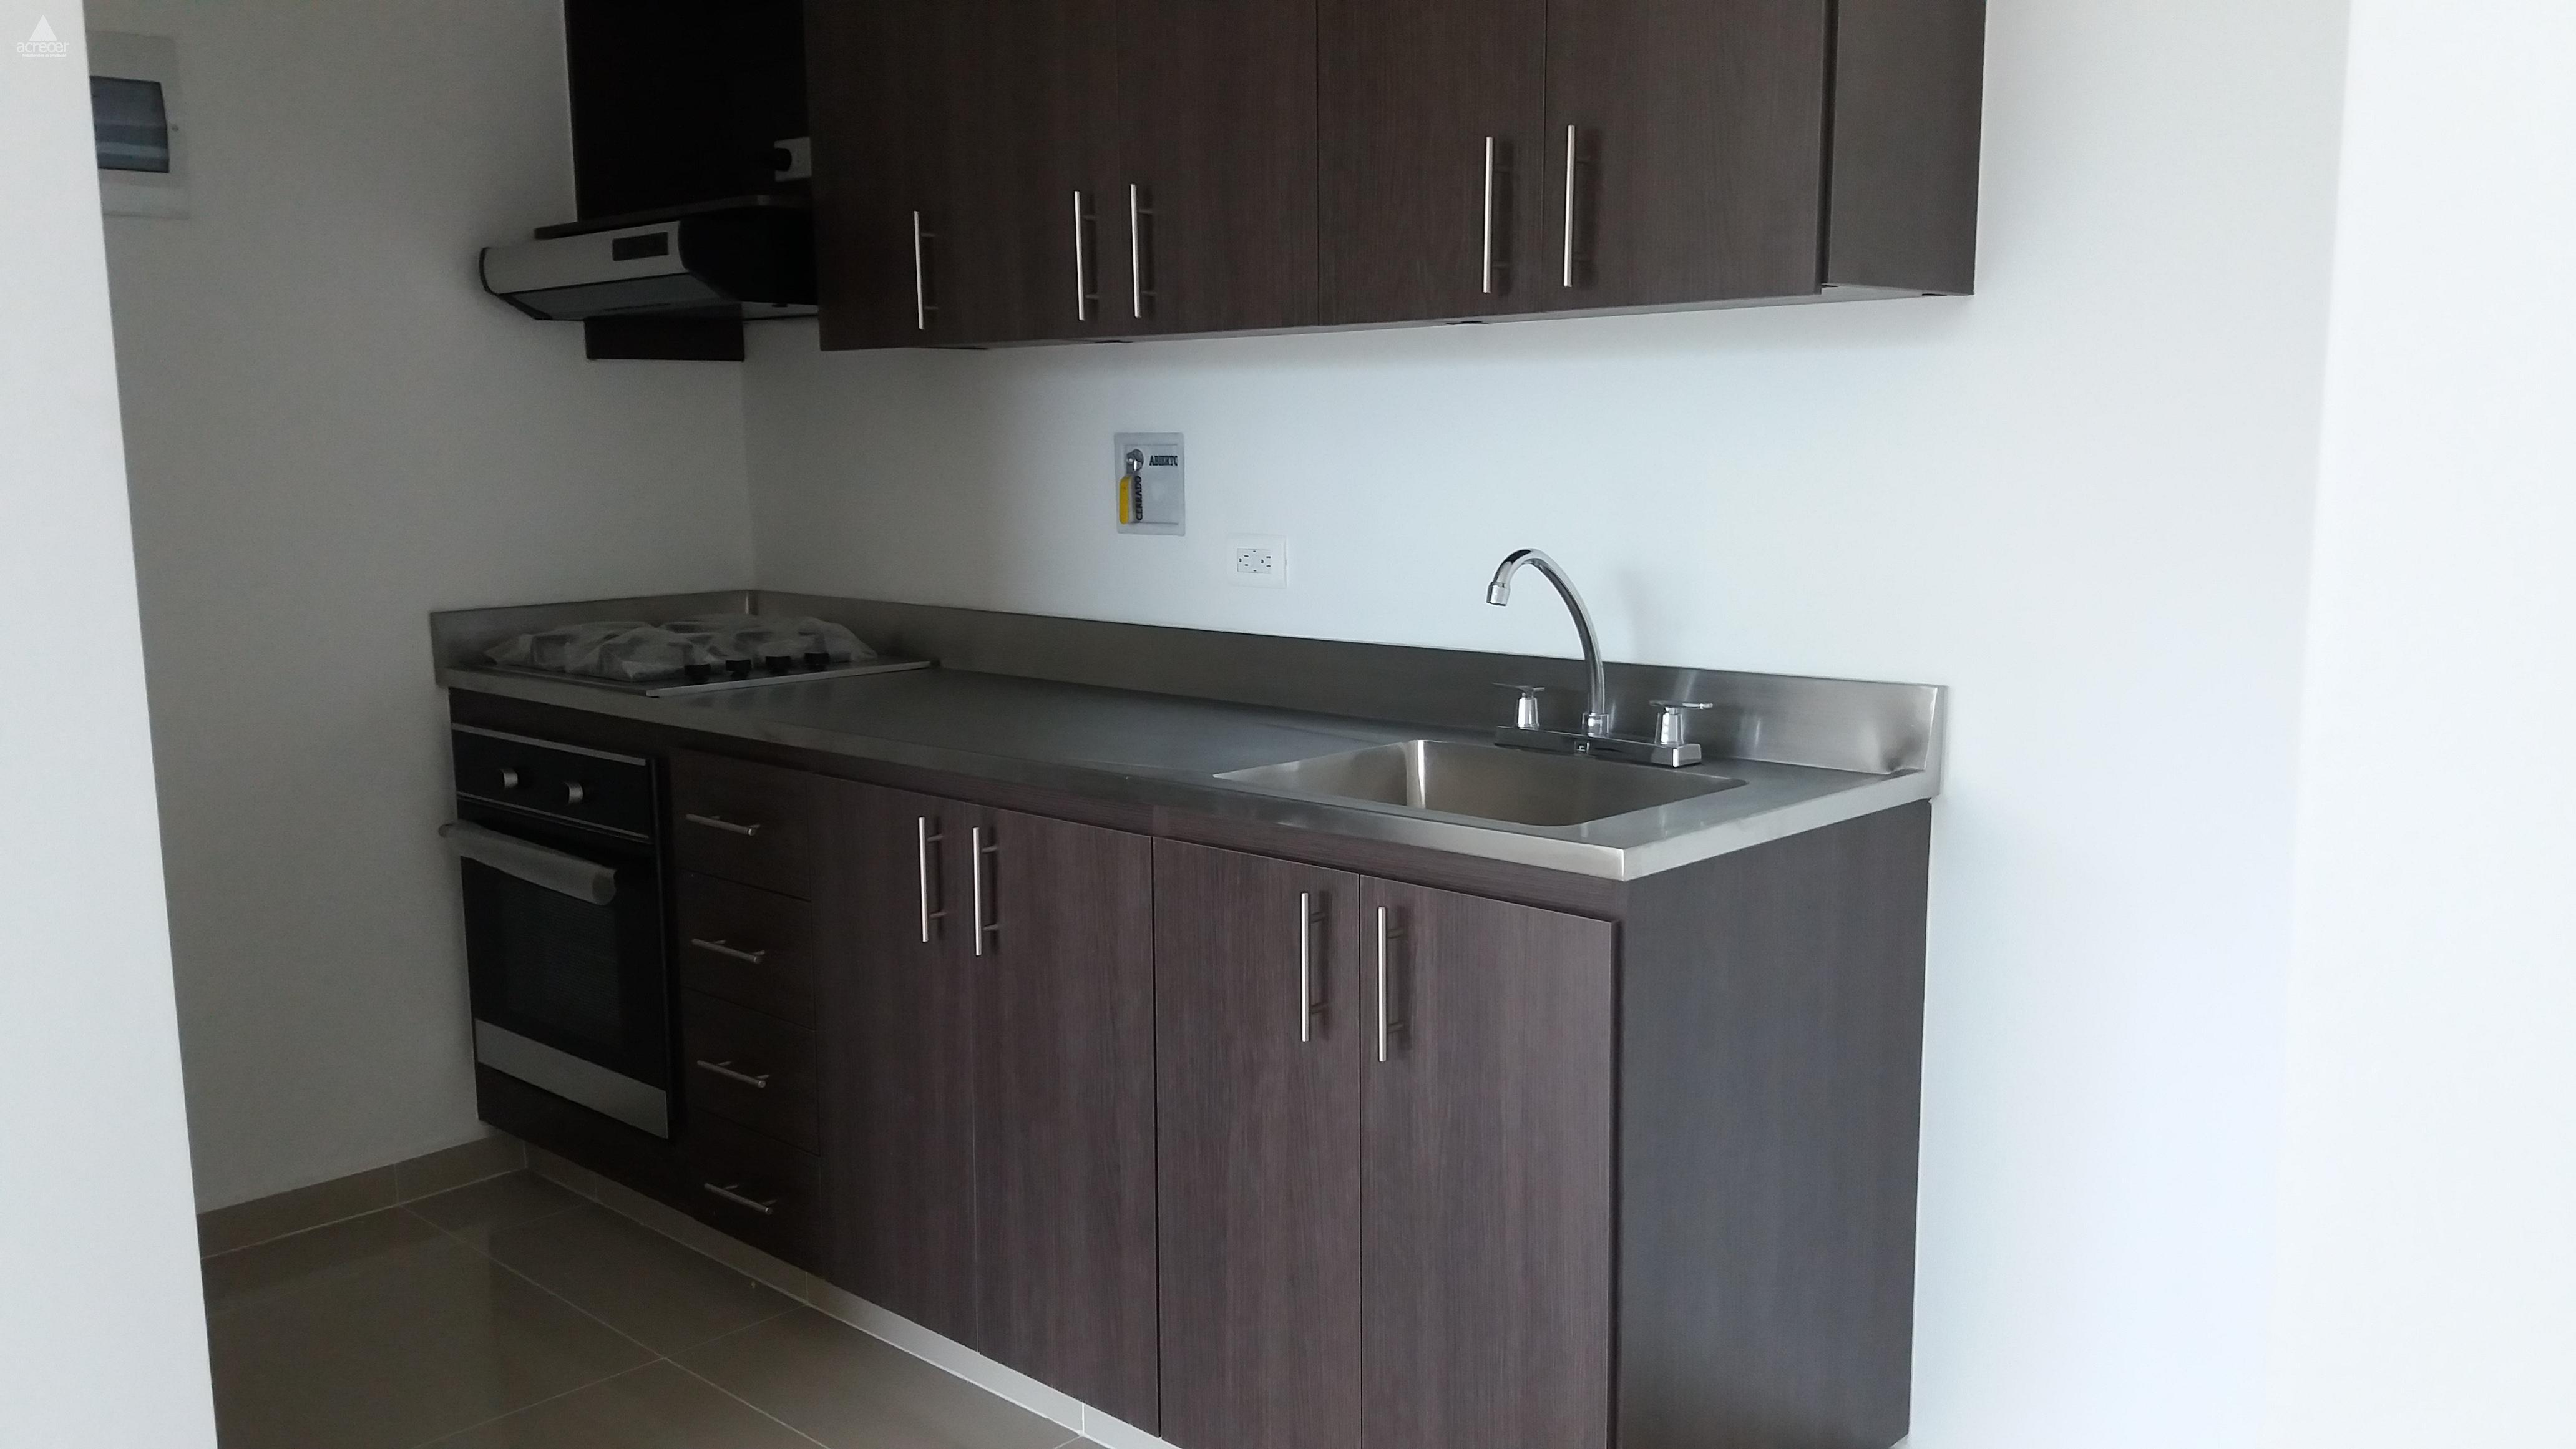 Venta de apartamento en goplaceit for Mobilia h m